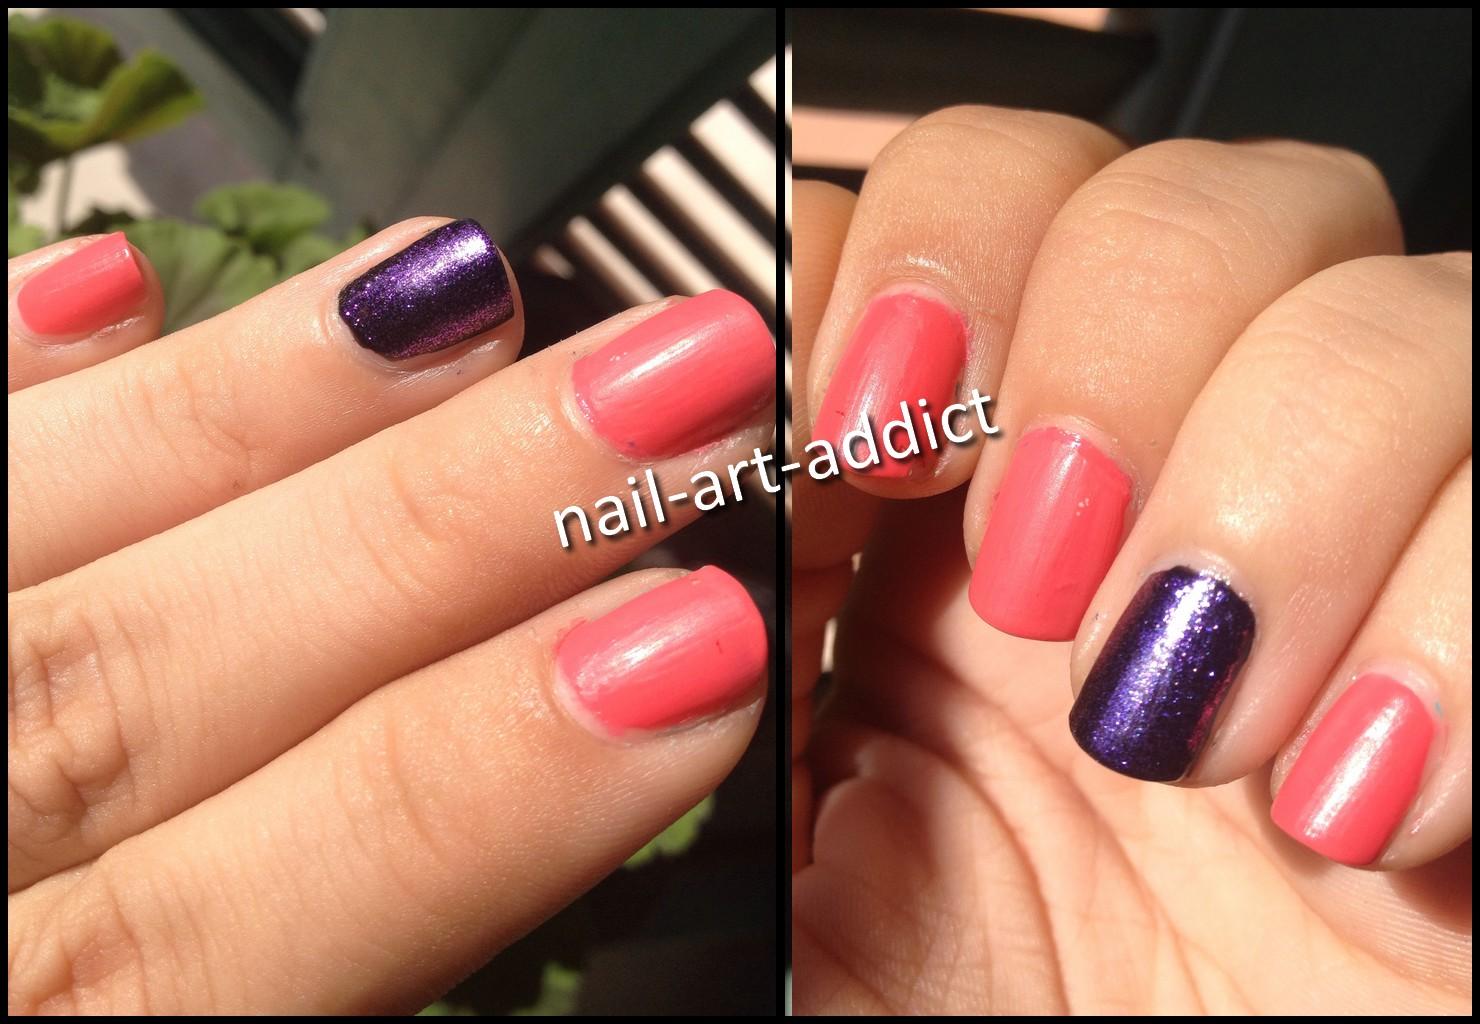 nail art beauty addict nail art bicolore mat. Black Bedroom Furniture Sets. Home Design Ideas